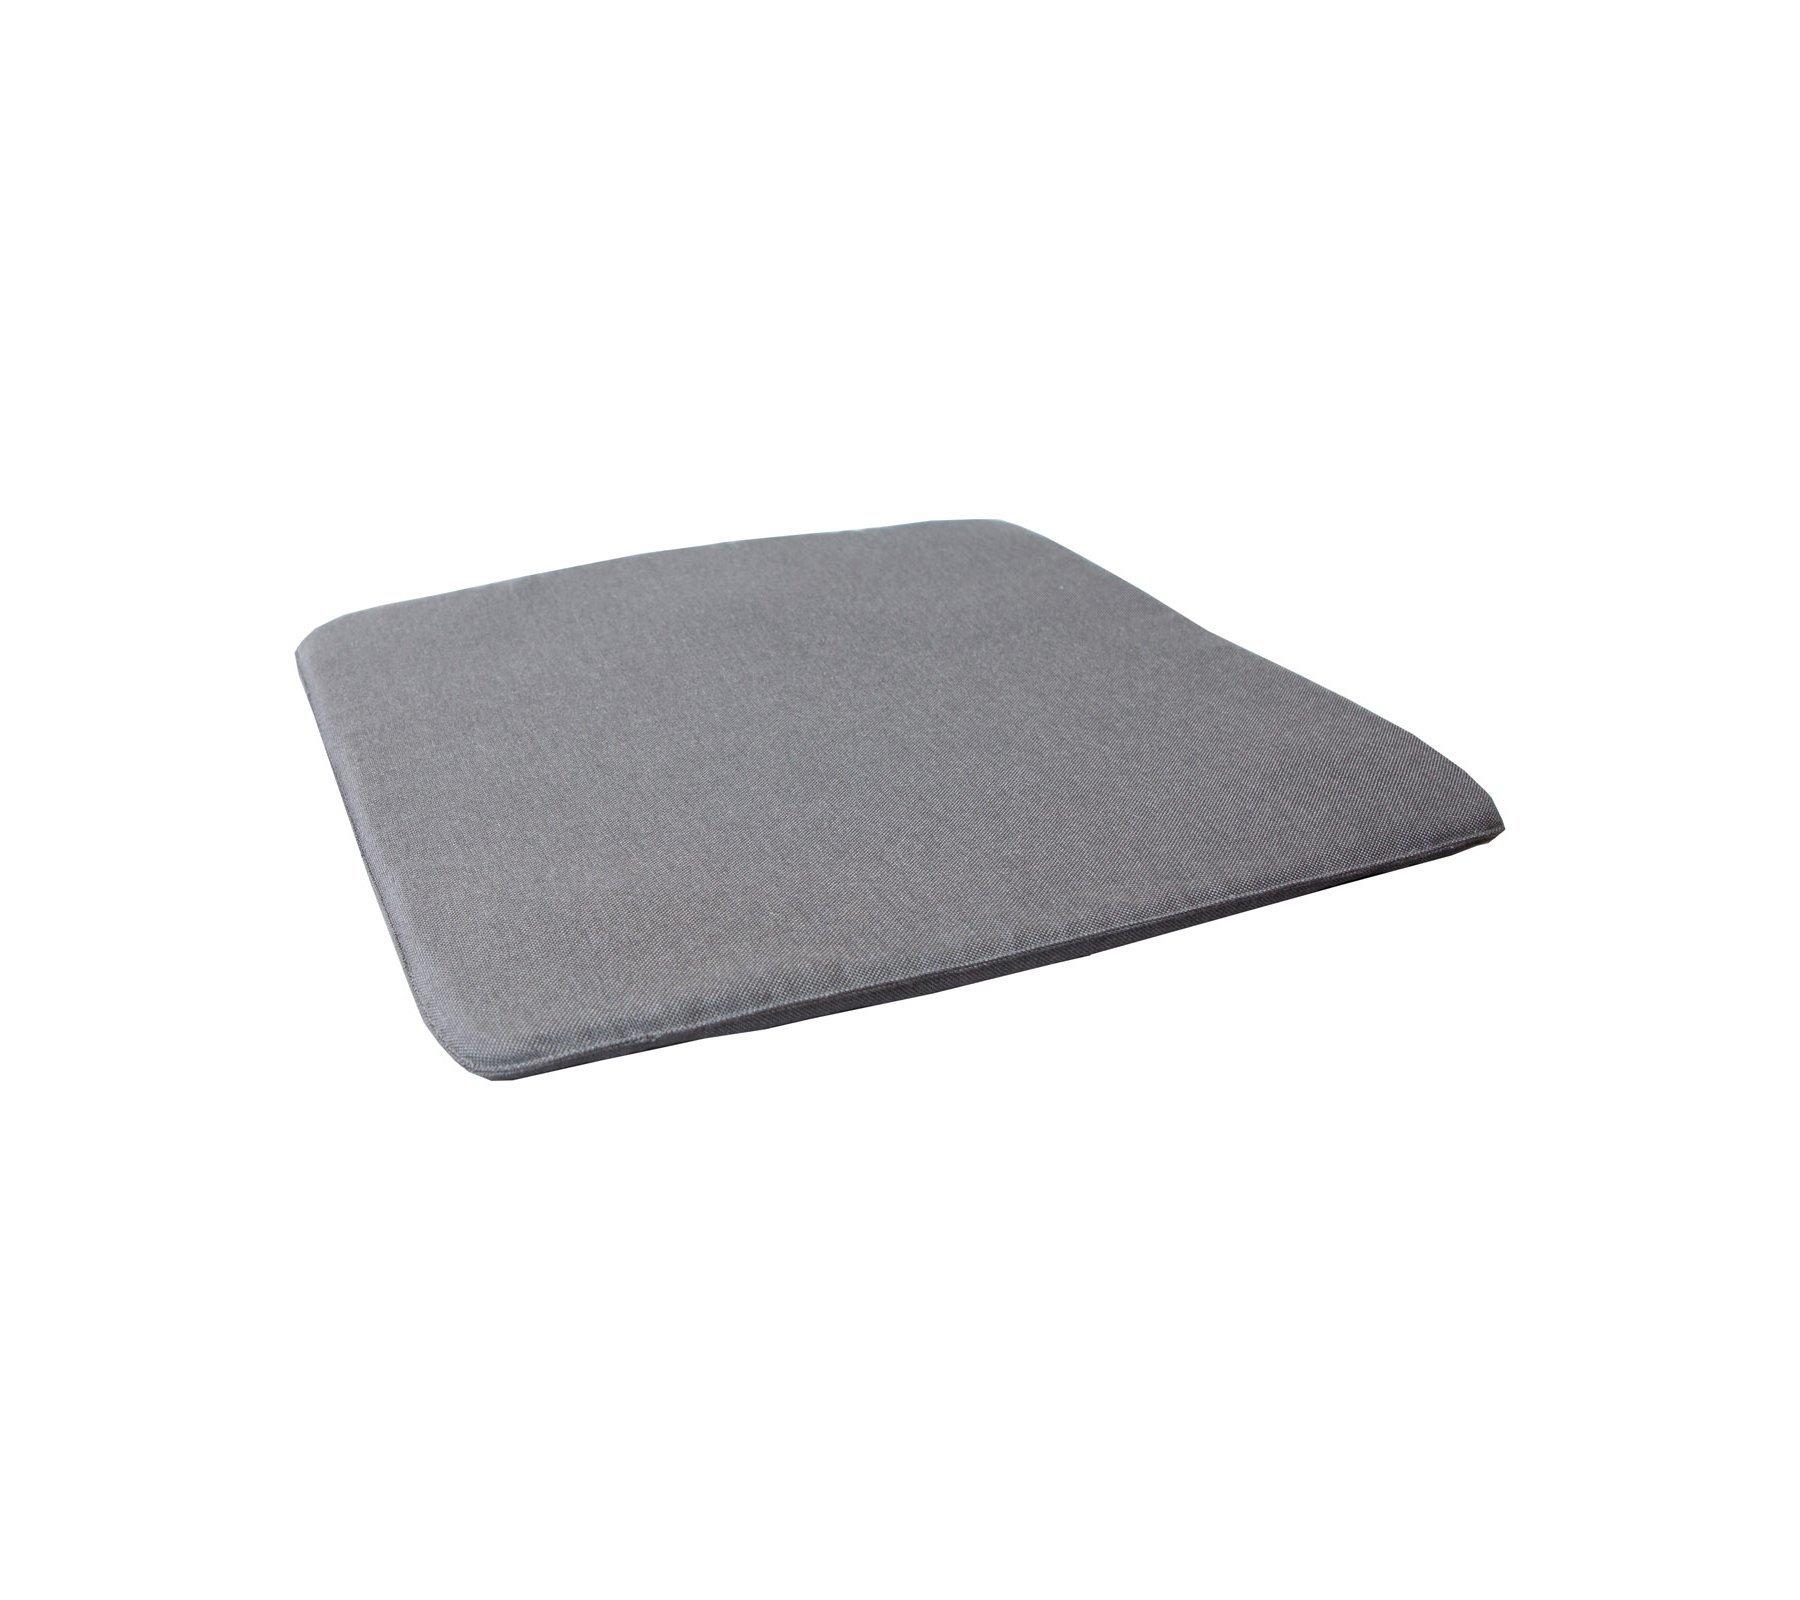 Amaze Seat cushion for Lounge chair / Sofa Cane-Line